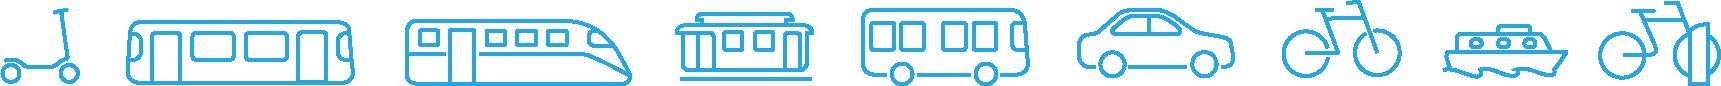 TS transit icons@300x